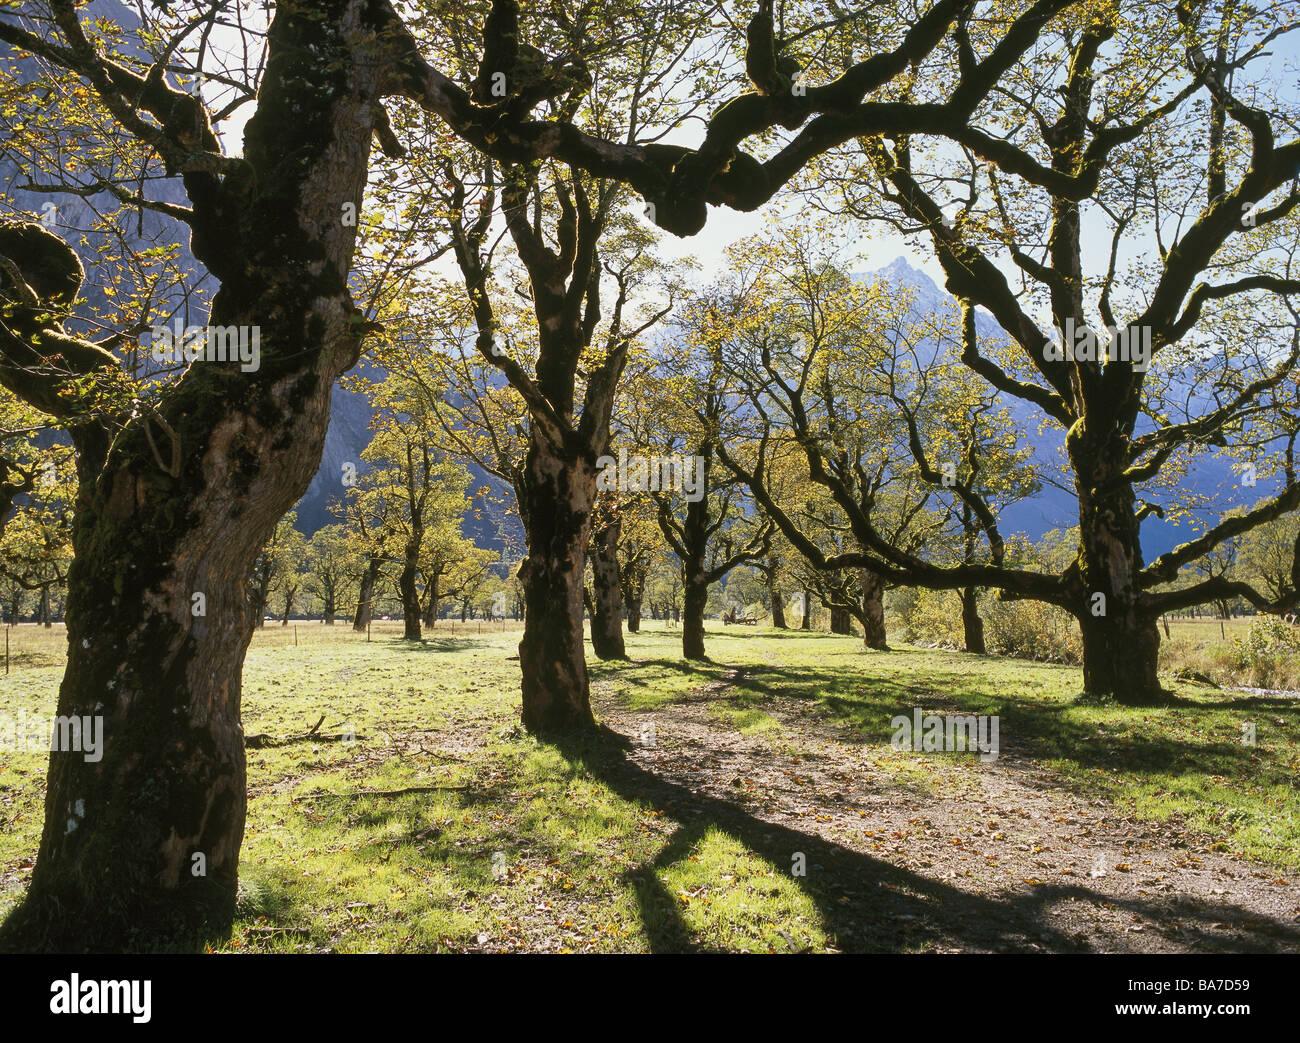 Austria Tyrol Narrow Trees Sycamore Autumn Nature Seasons Plants